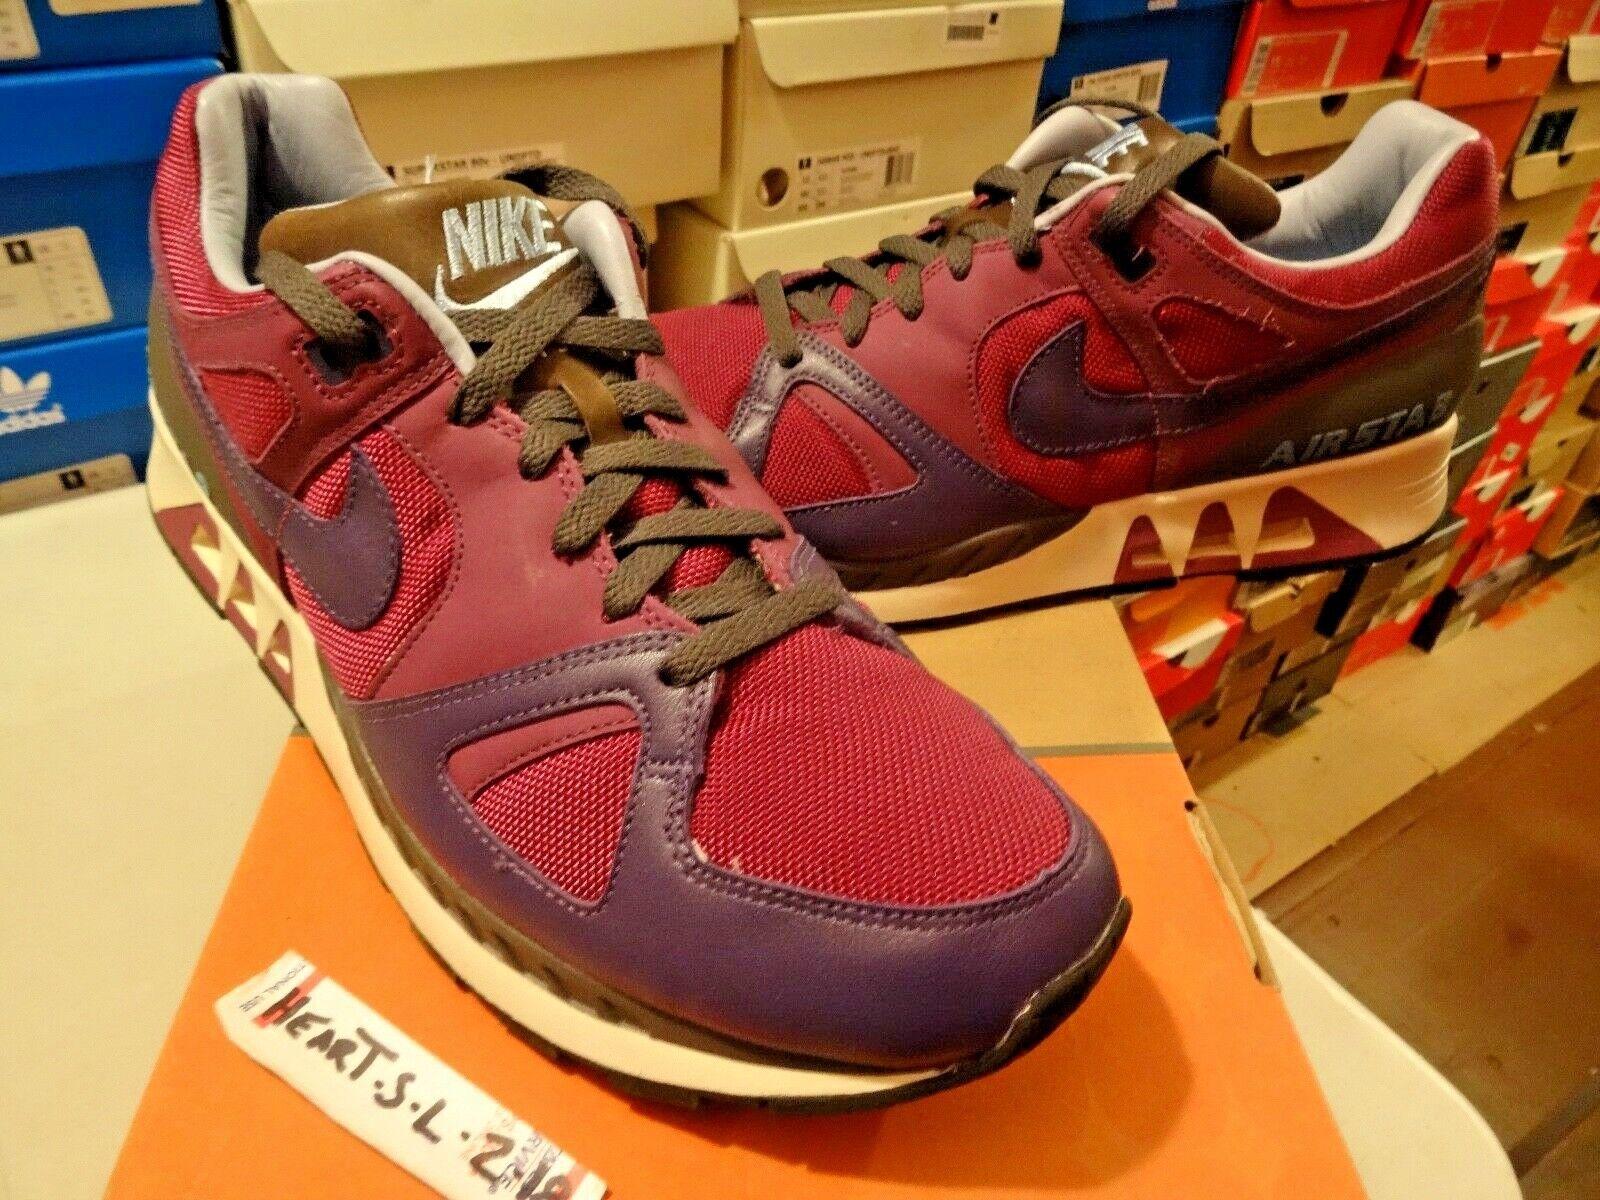 NEW Nike Air Max Stab Premium SP + Air U Breathe + Ink viola 314250-651 SZ 13